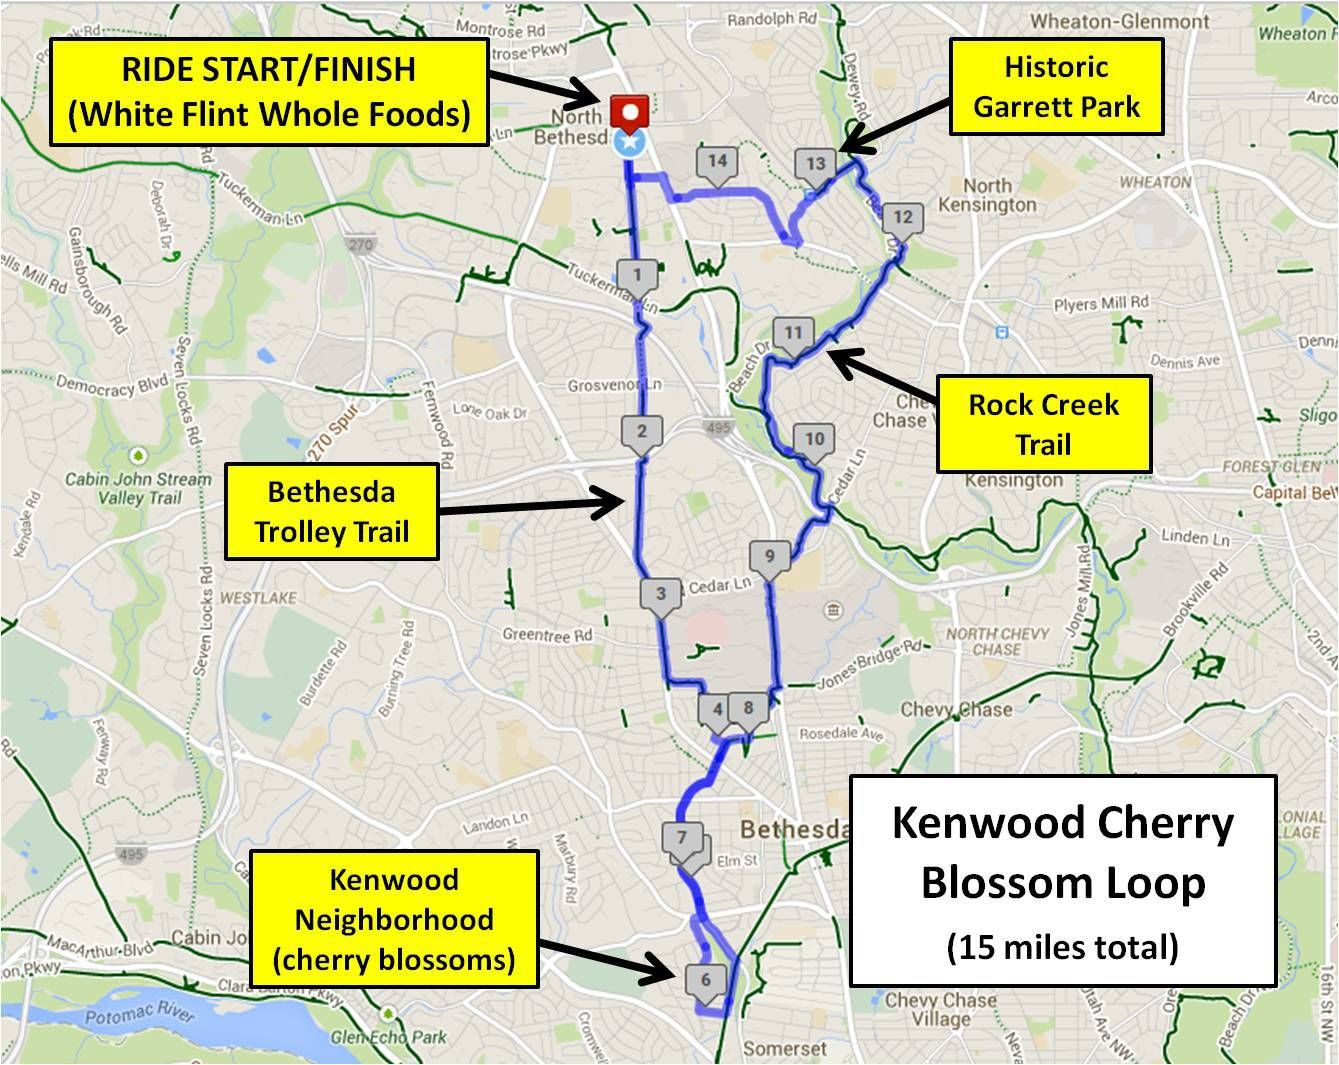 The Kenwood Cherry Blossom Loop (15 miles) | Bike Rockville: Casual ...